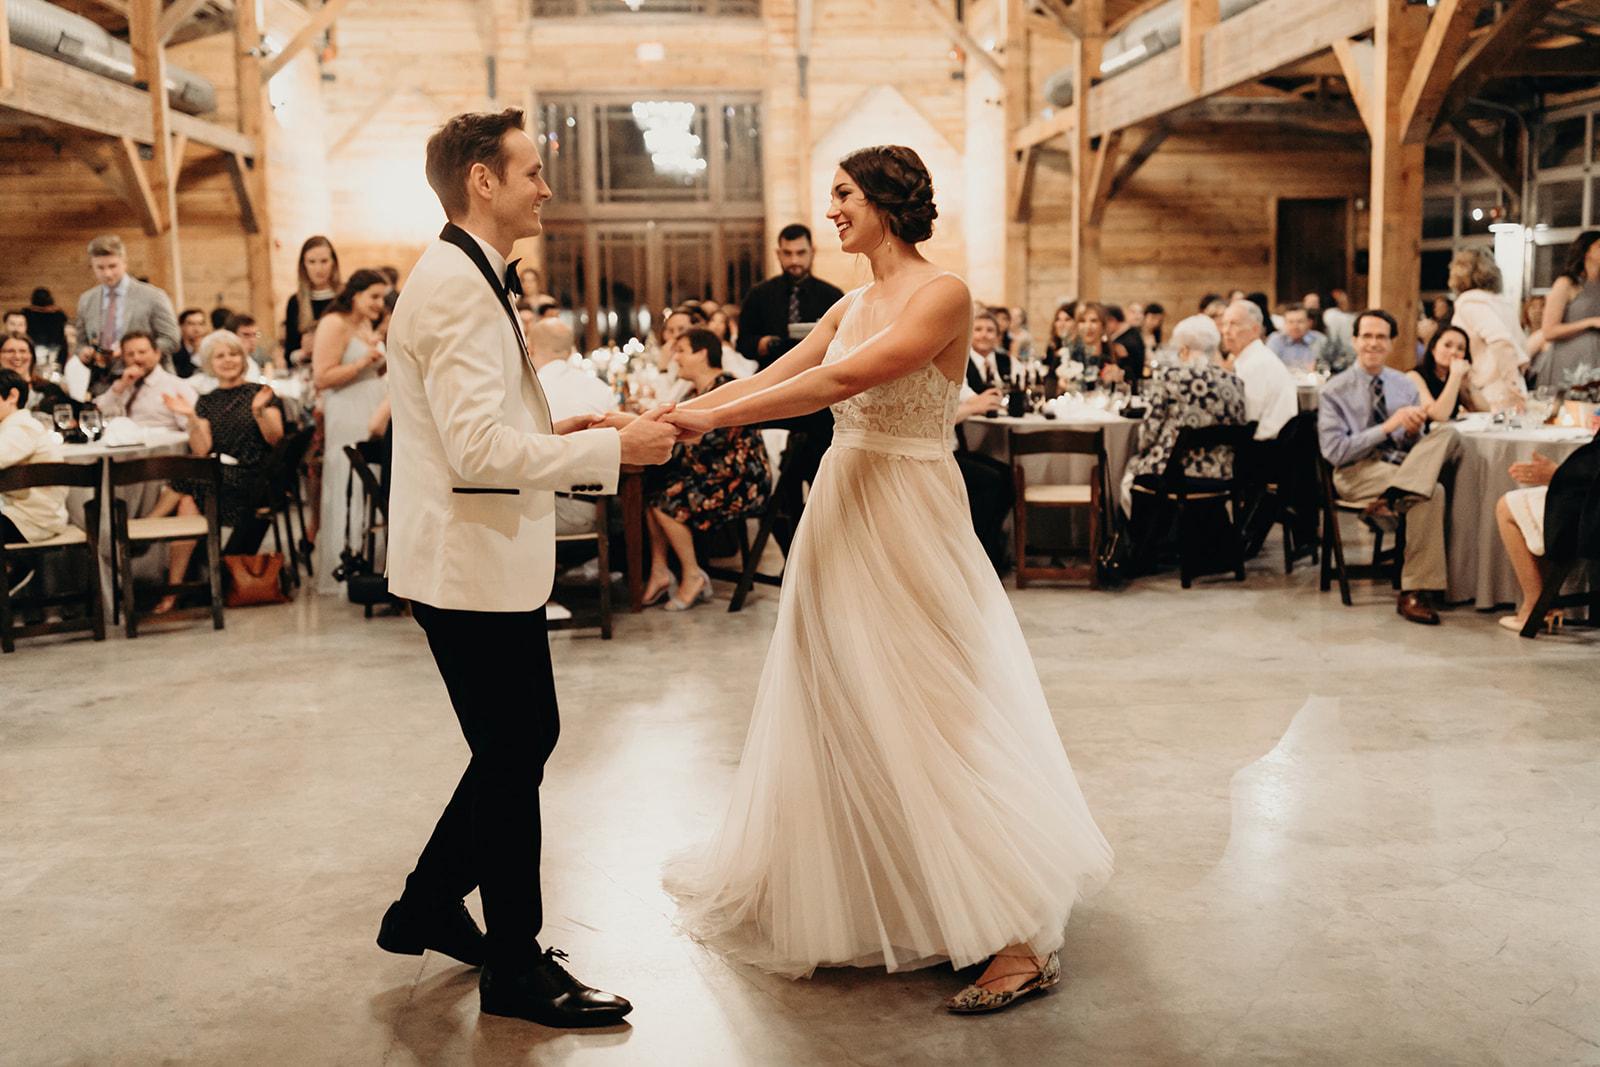 austin-wedding-lindsey-bryce-762.jpg